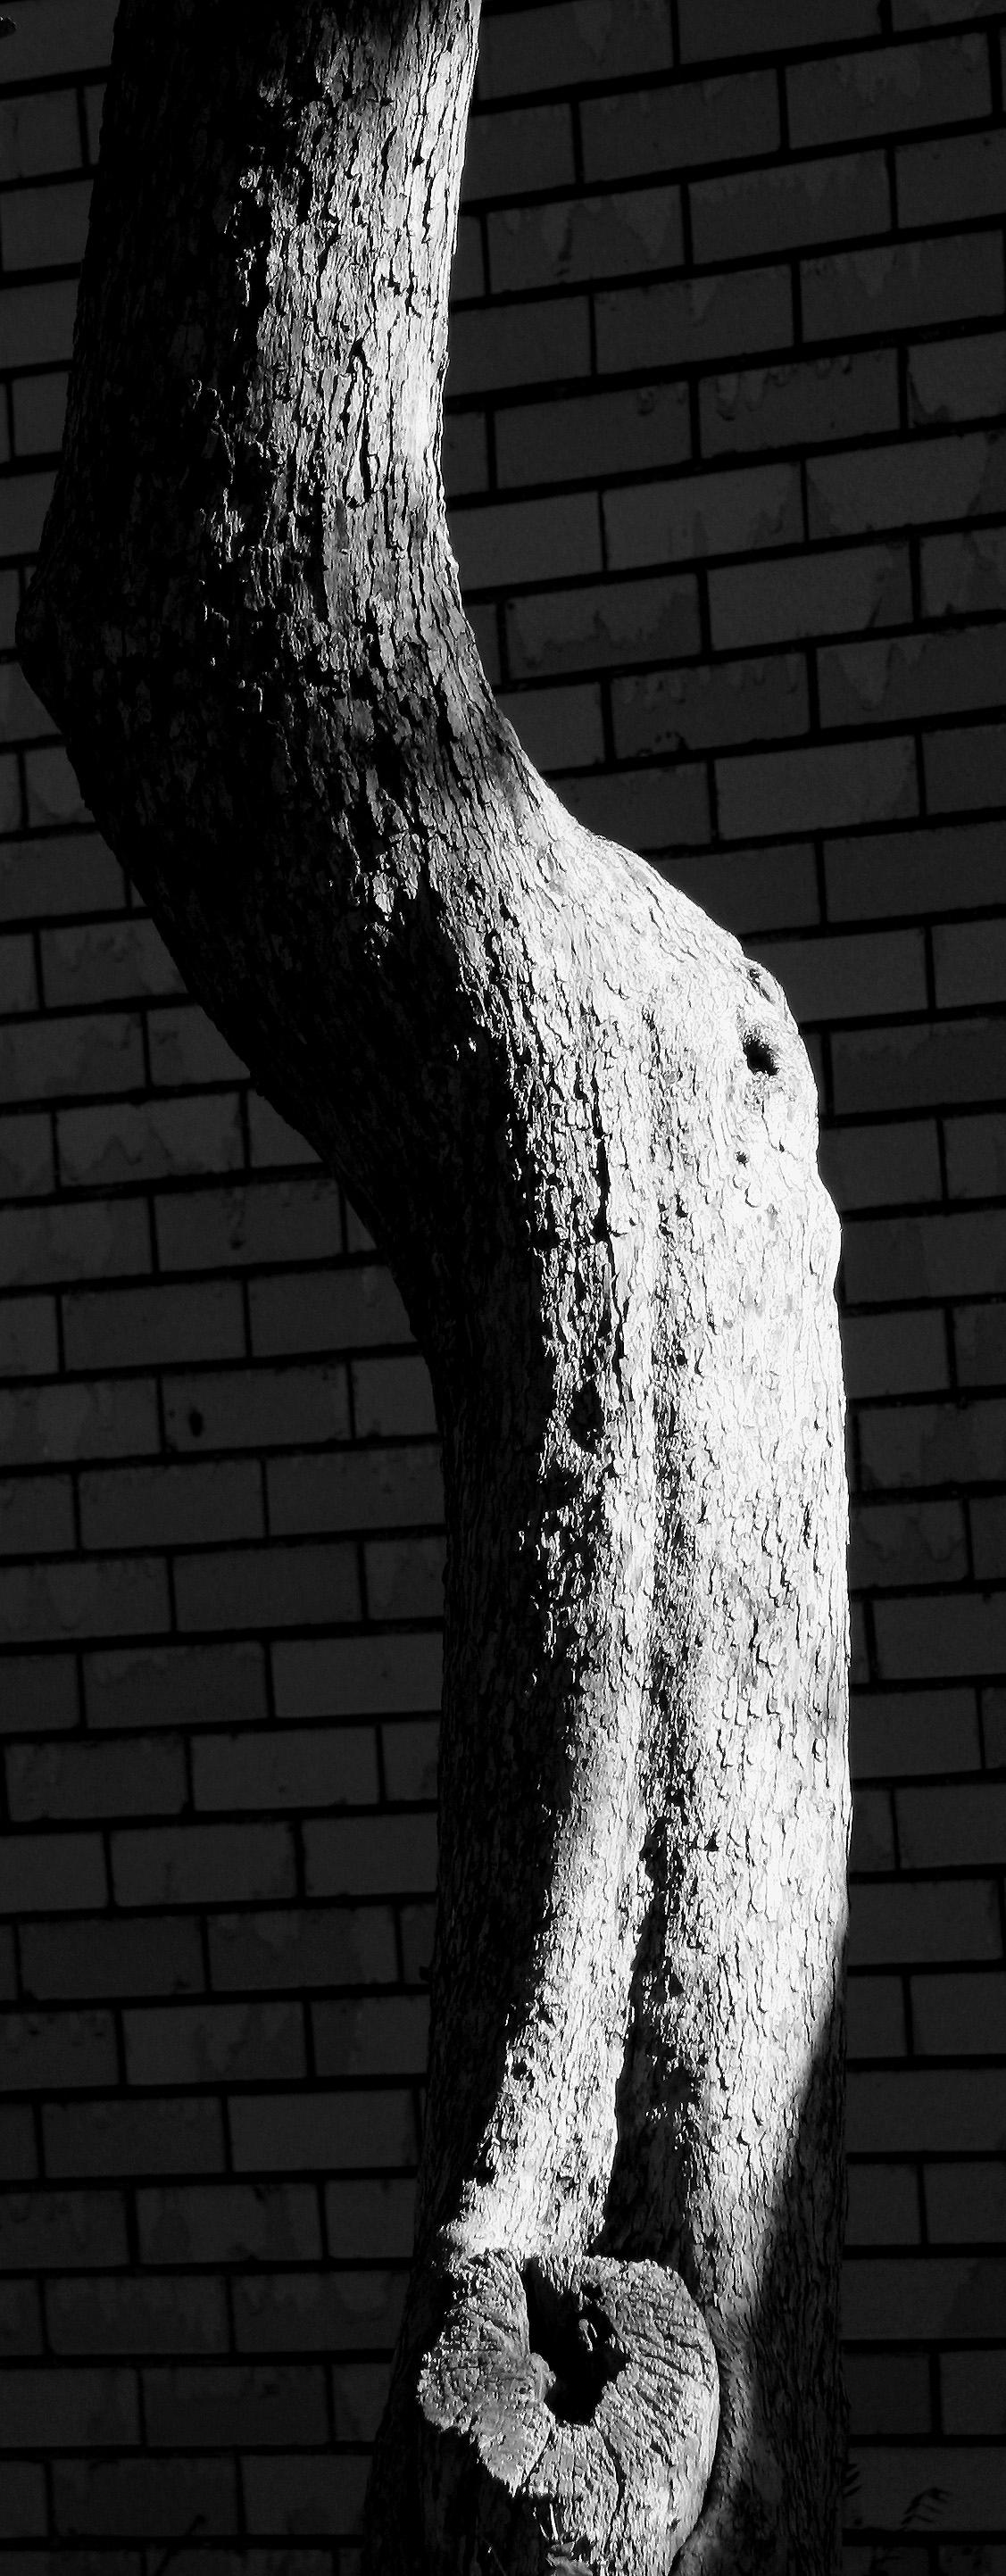 Hawthorne Tree Trunk